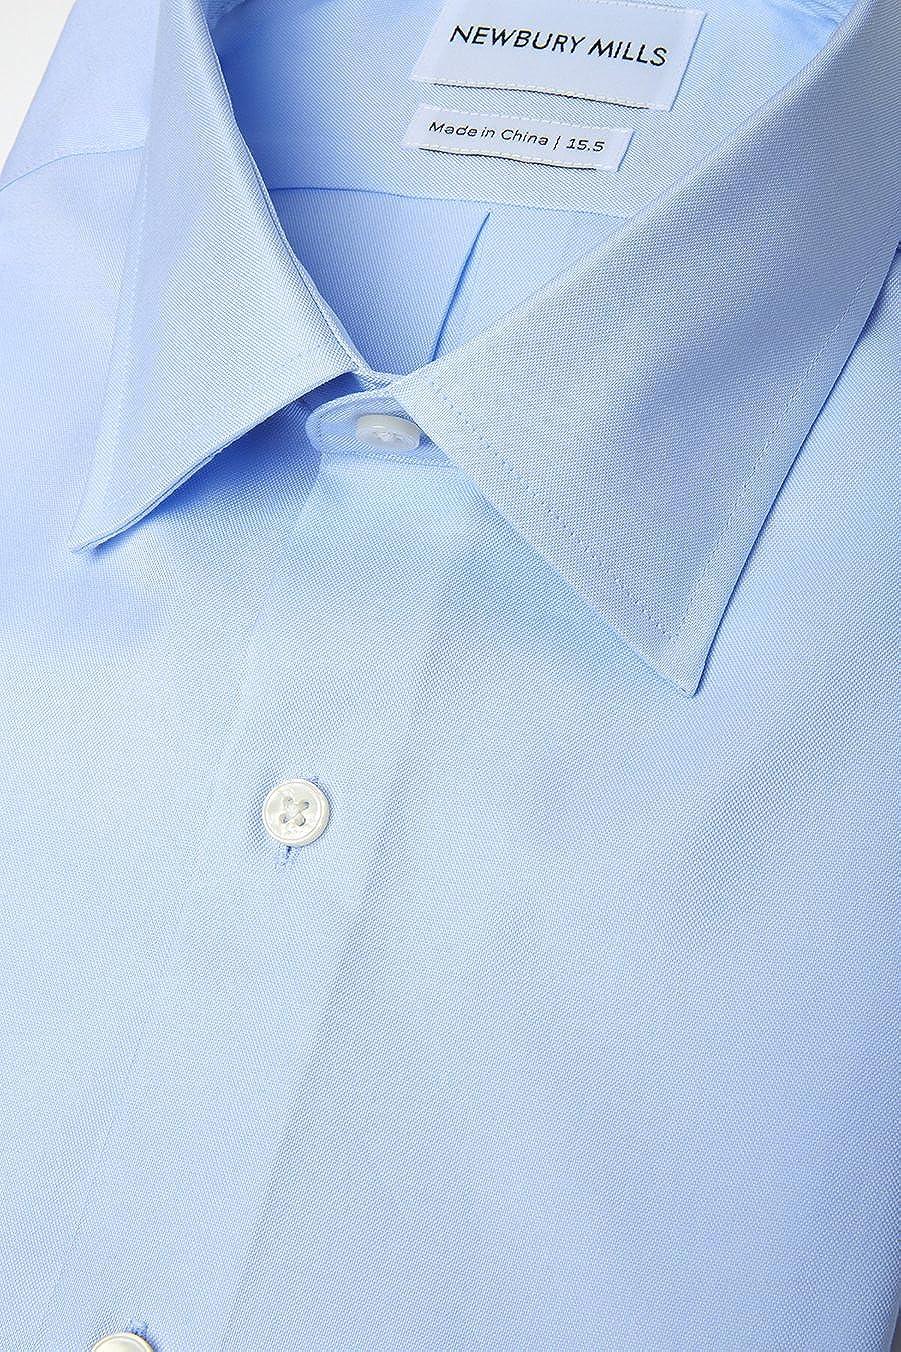 Newbury Mills Solid Blue Dress Shirt At Amazon Mens Clothing Store